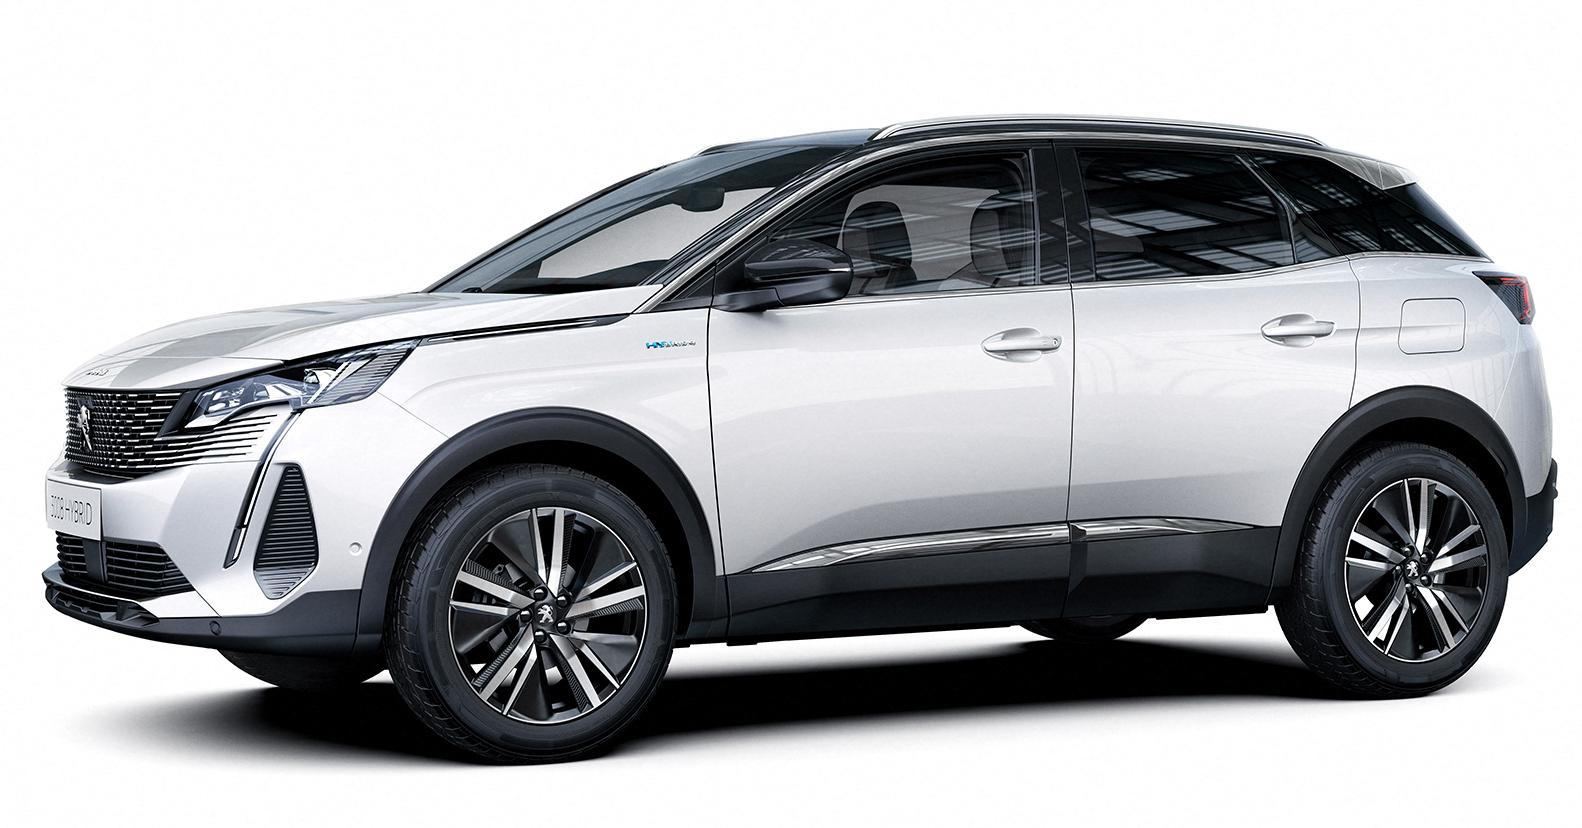 2021-Peugeot-3008-Facelift-Extra-Pics-10.jpg